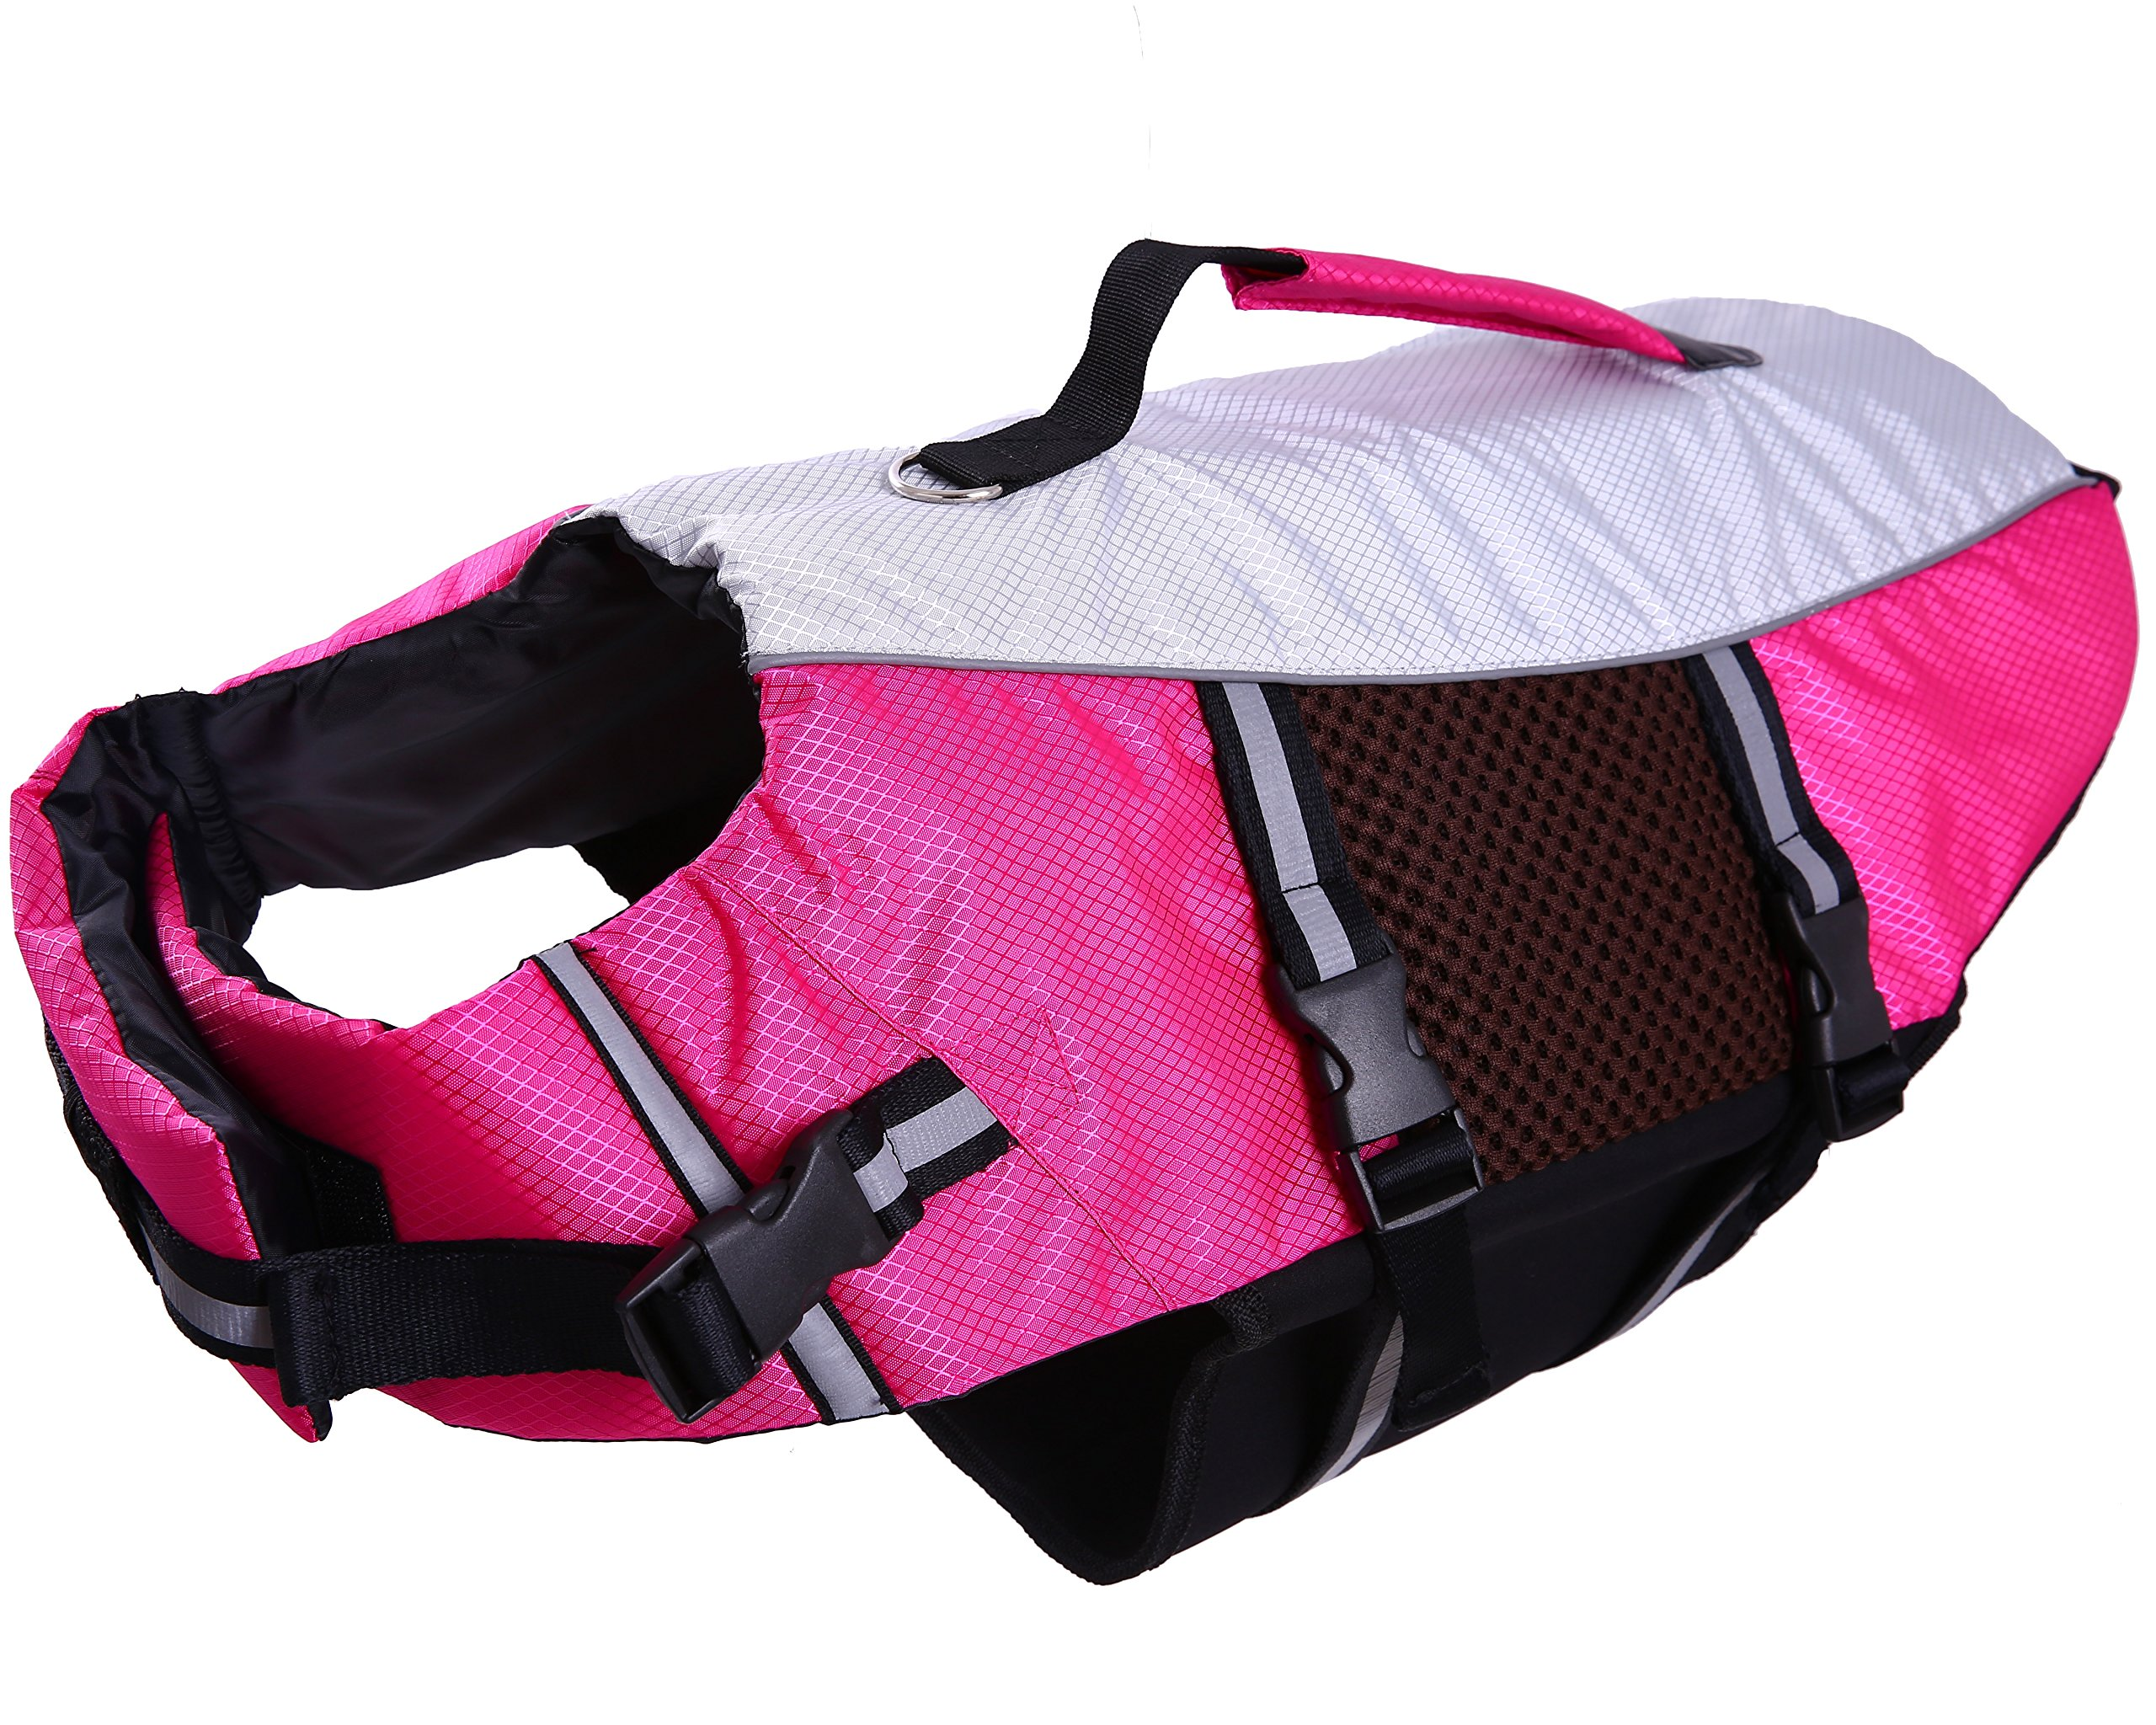 Dog Life Jacket Large ,Dogs Life Vests For Swimming Extra Large,Float Coat Swimsuits Flotation Device Life Preserver Belt LifesaverFlotation Suit For Pet BulldogWith Reflective Straps Rose xxl by QBLEEV